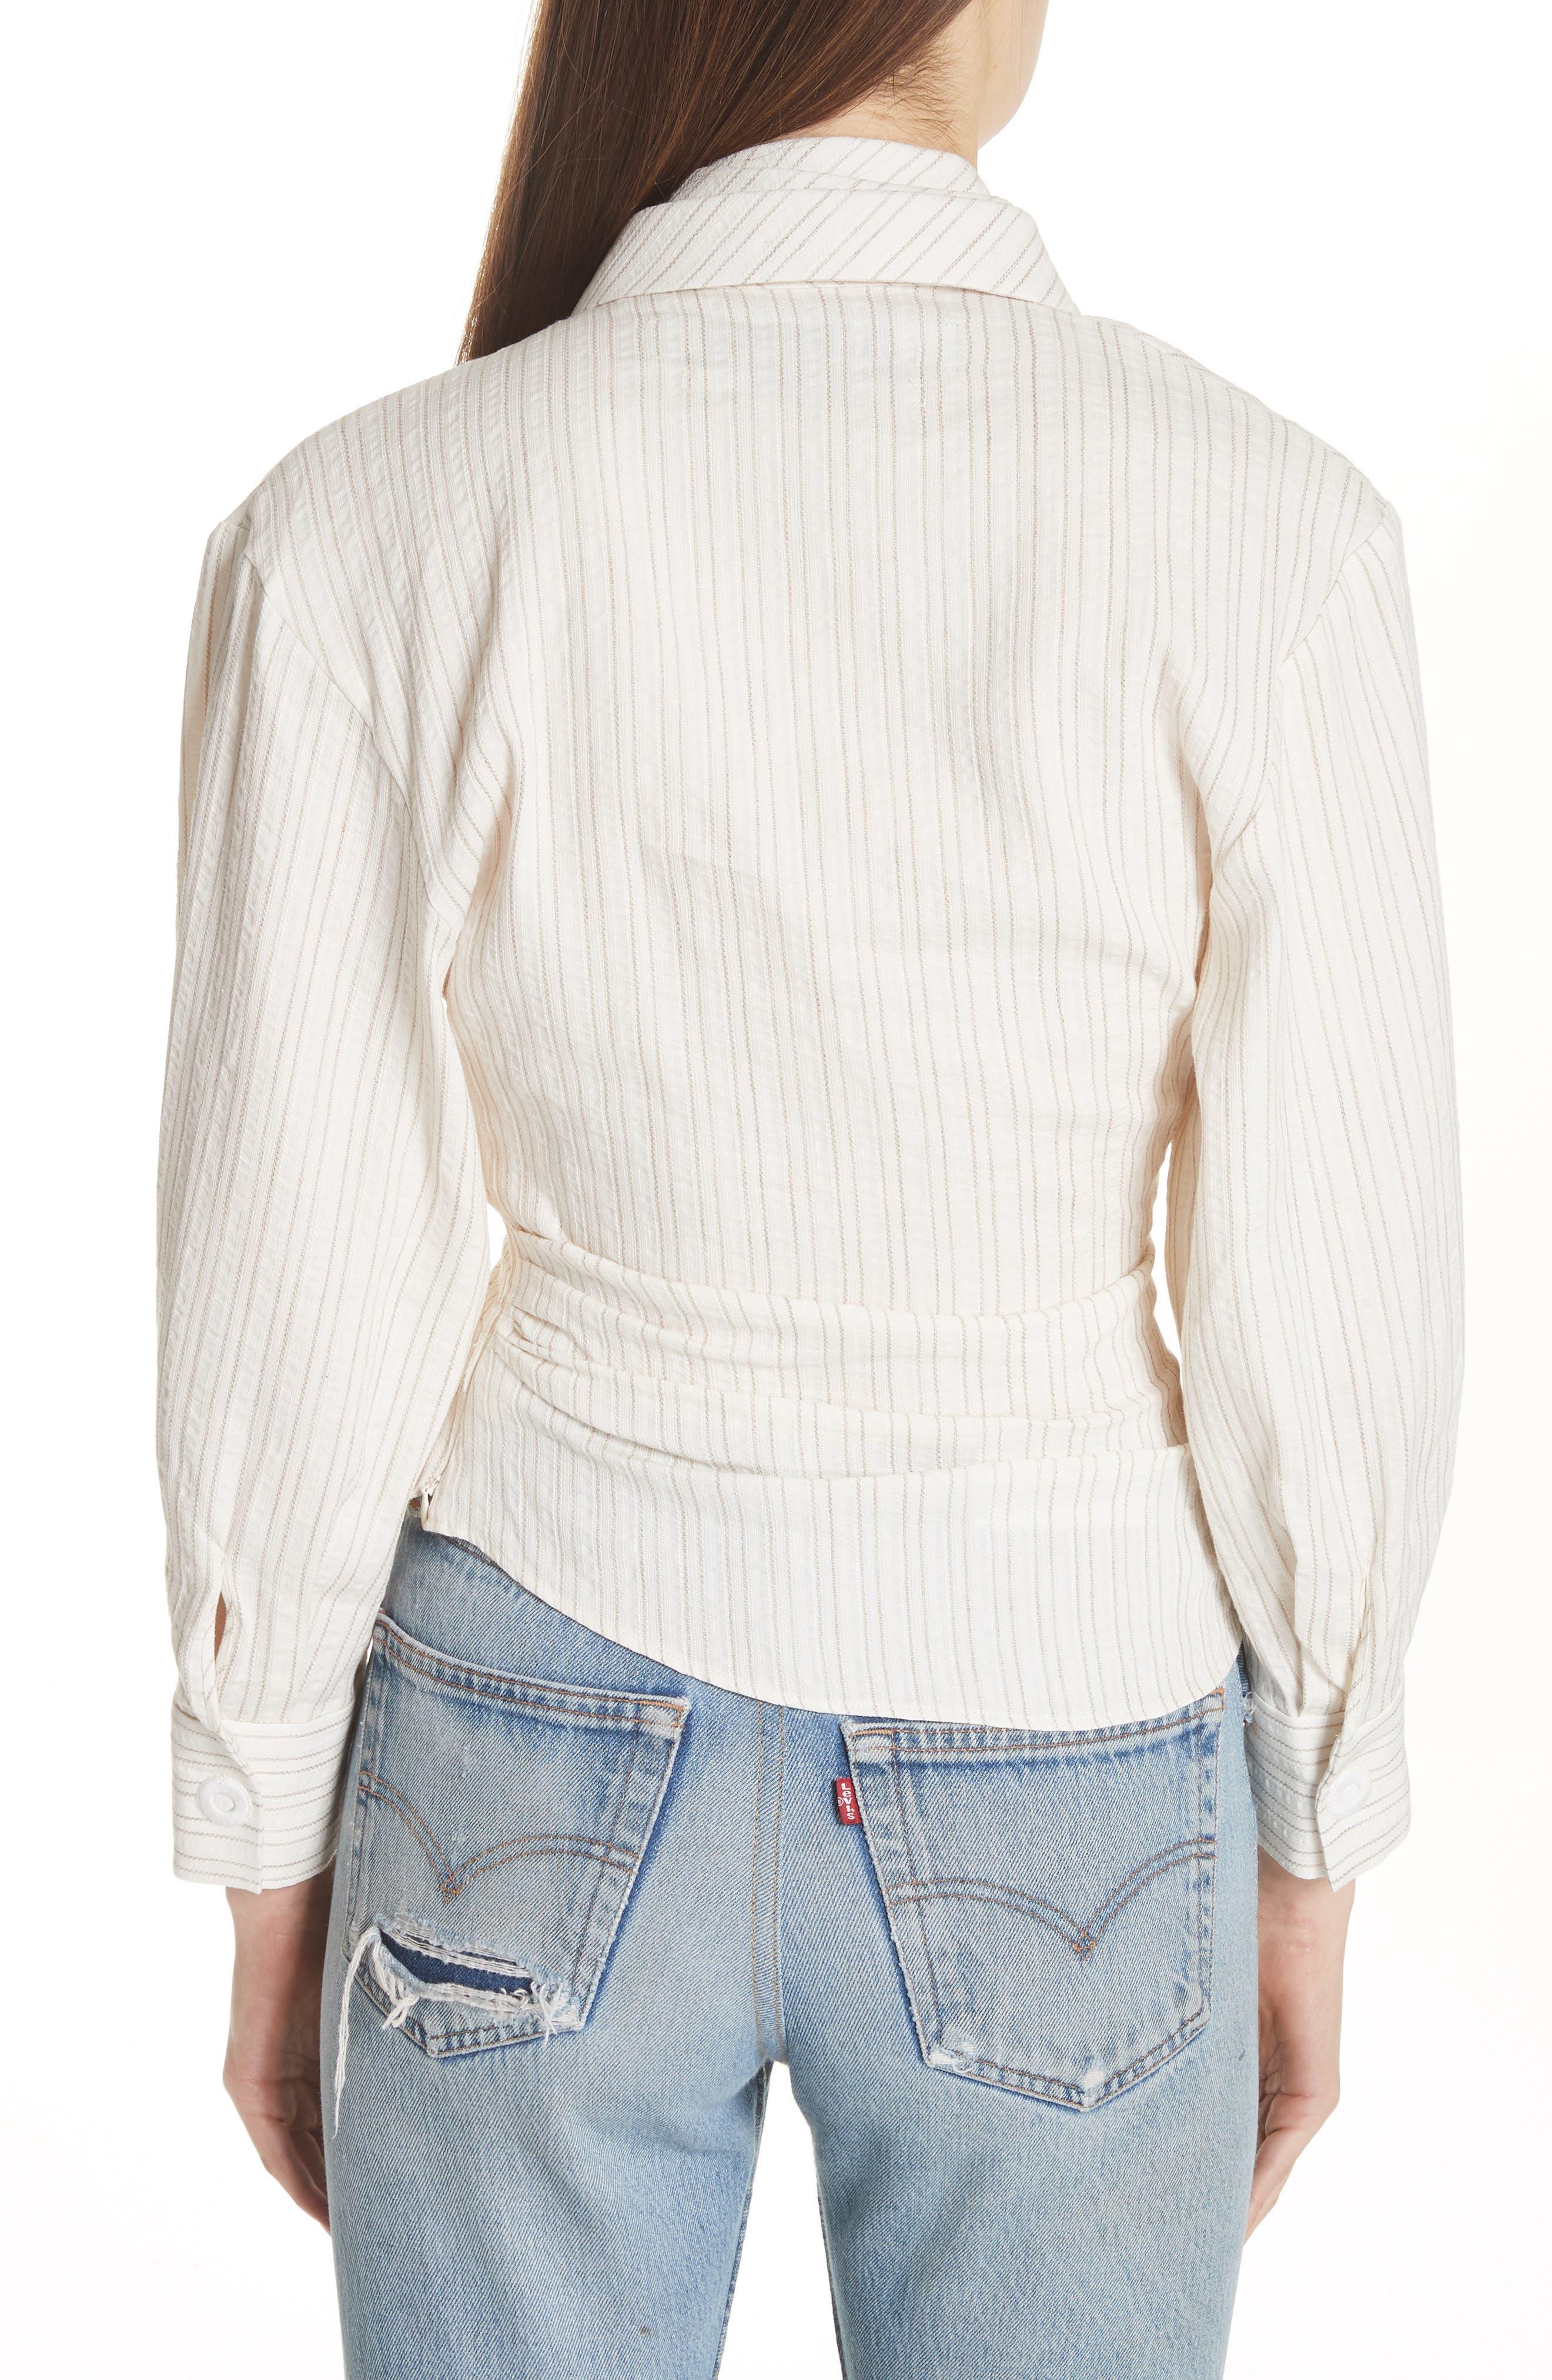 La Chemise Belem Shirt,                             Alternate thumbnail 2, color,                             Beige Striped